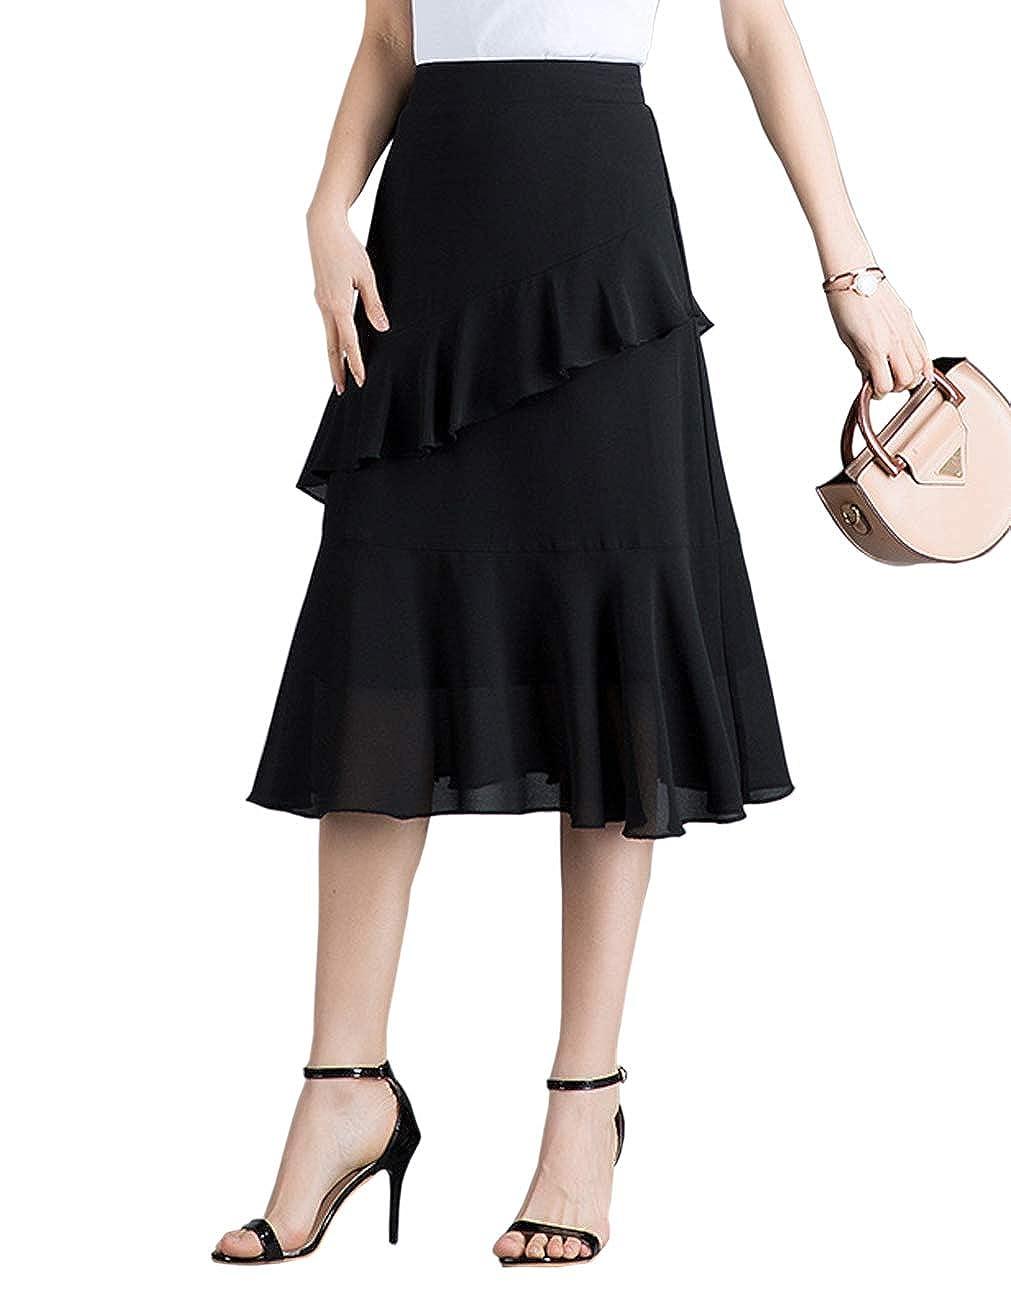 1920s Skirt History LAKERUI Women Chiffon Flared Midi Skirt Floral Print Tiered Ruffled Sheath Skirt with Elastic Waist $18.99 AT vintagedancer.com